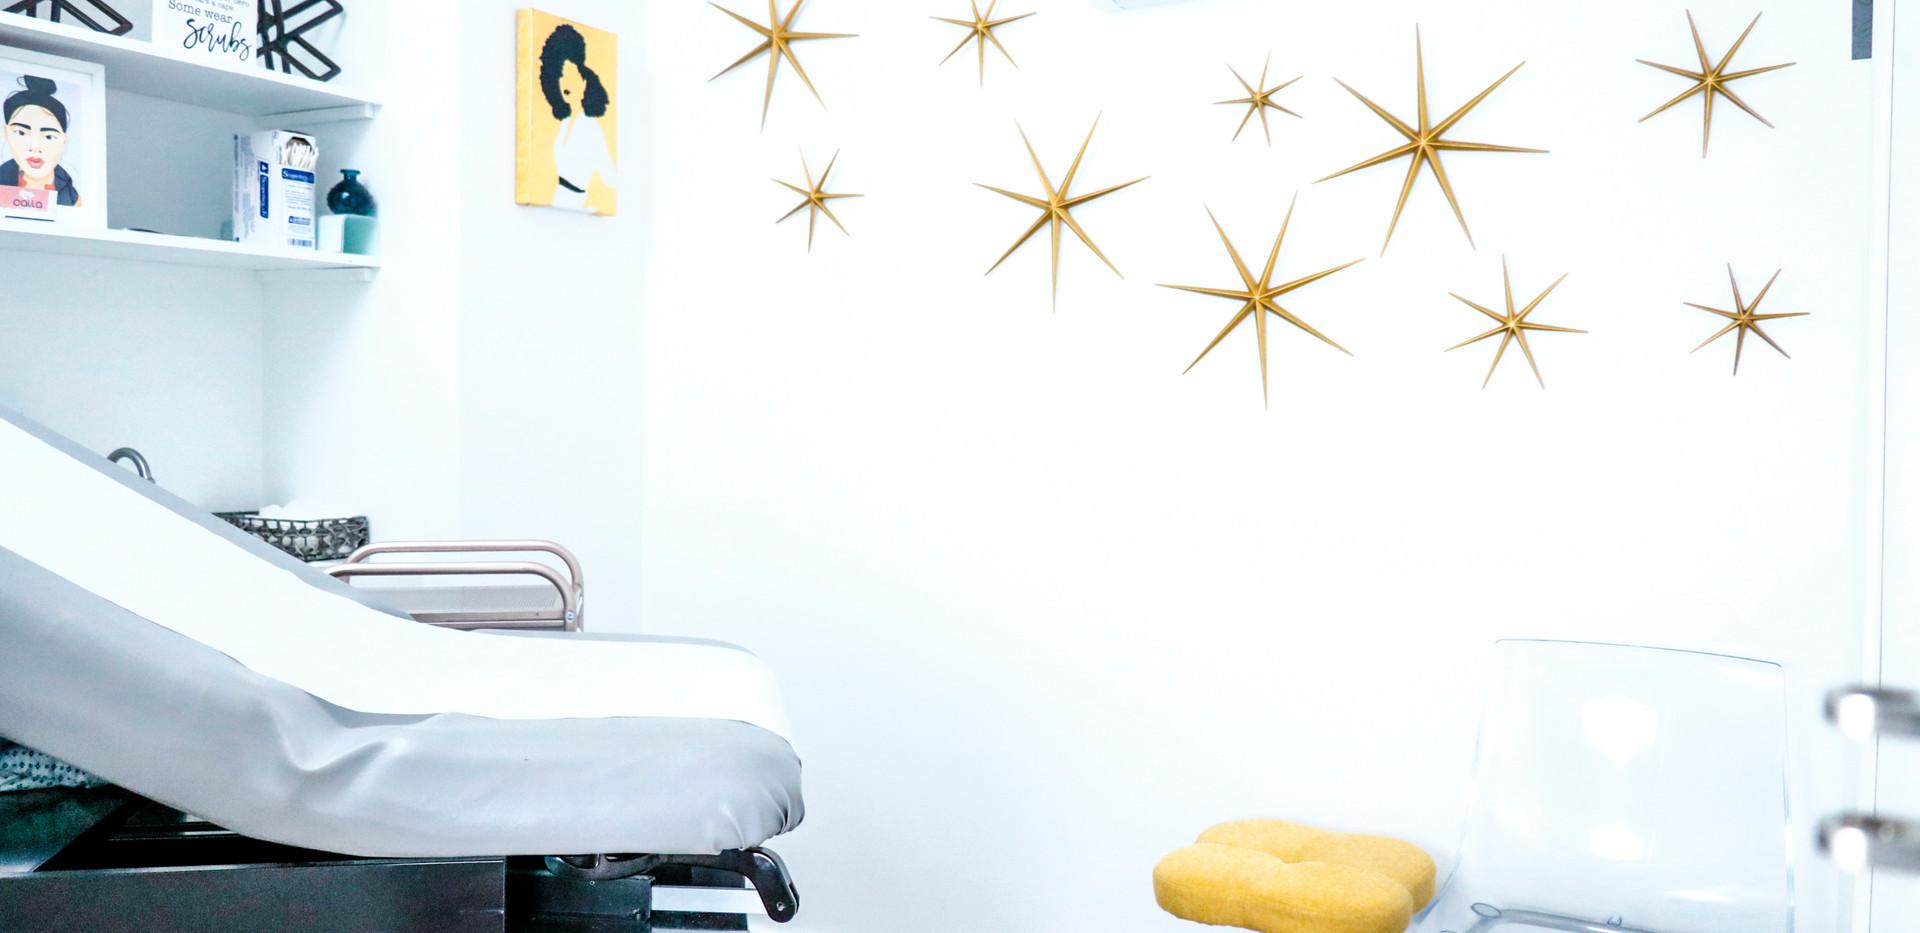 Star studded treatment...